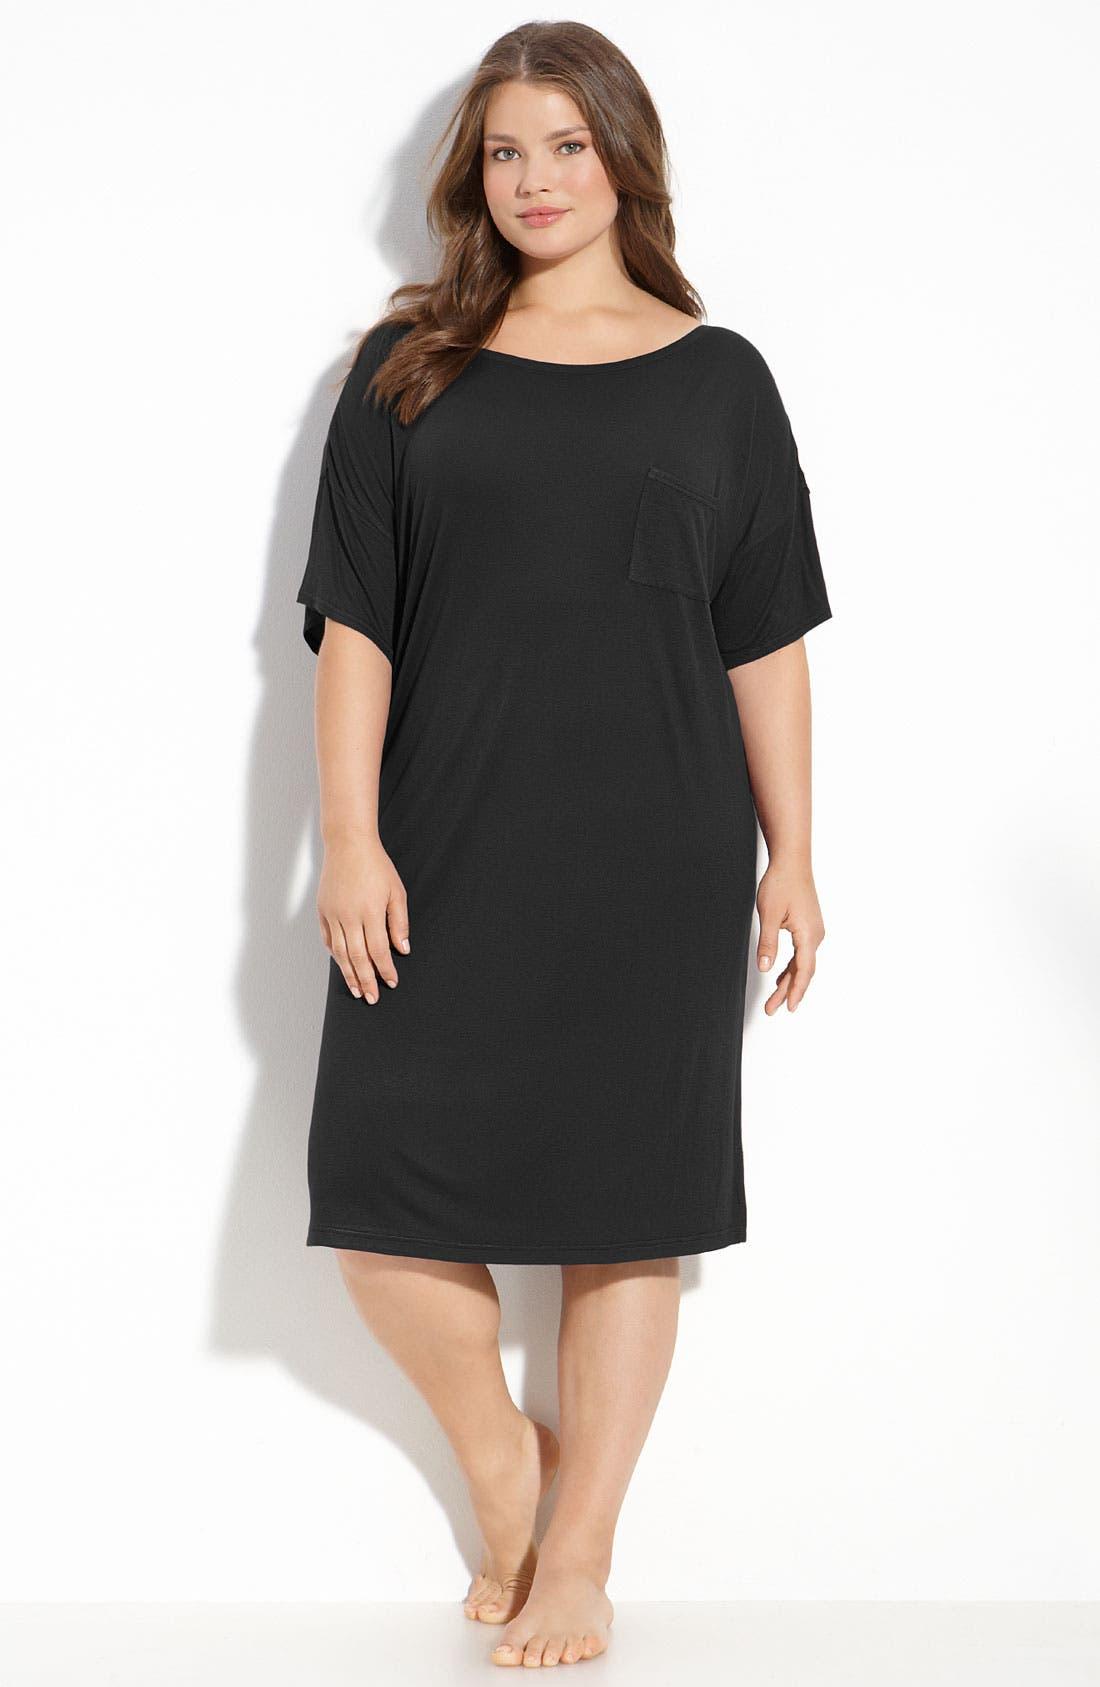 'Perfect' Night Shirt,                         Main,                         color, Black